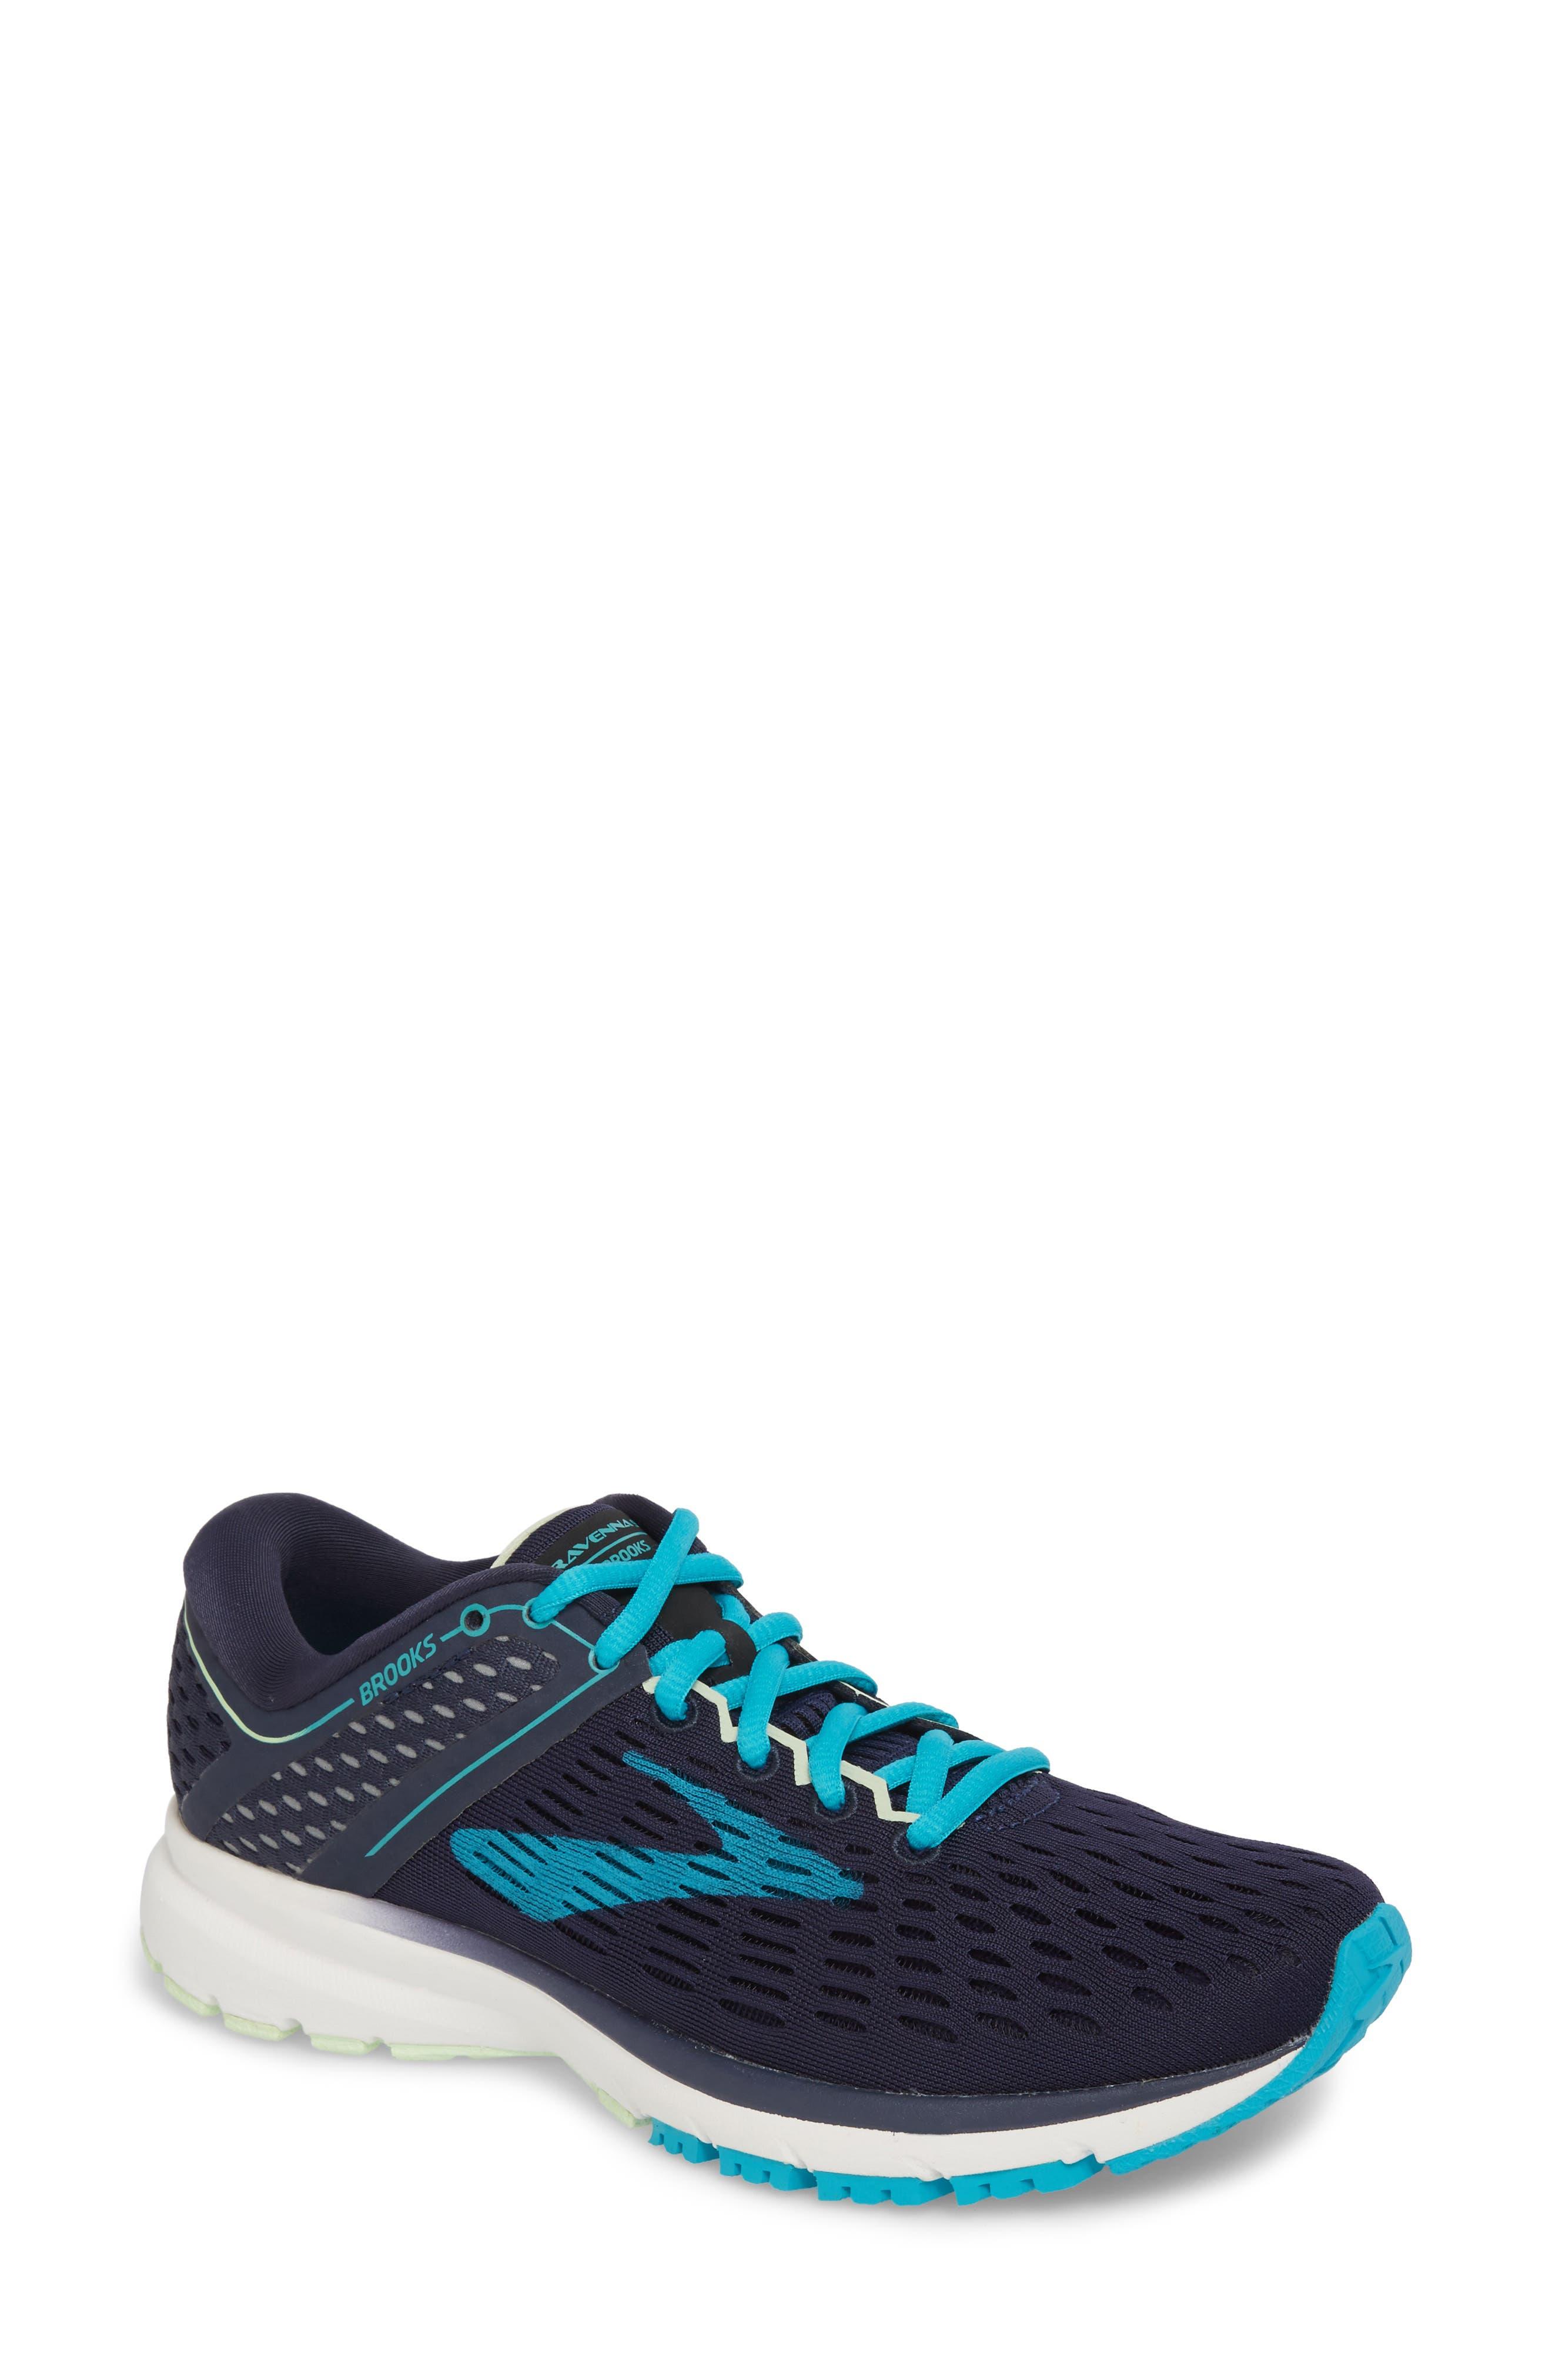 Brooks Ravenna 9 Running Shoe, Blue